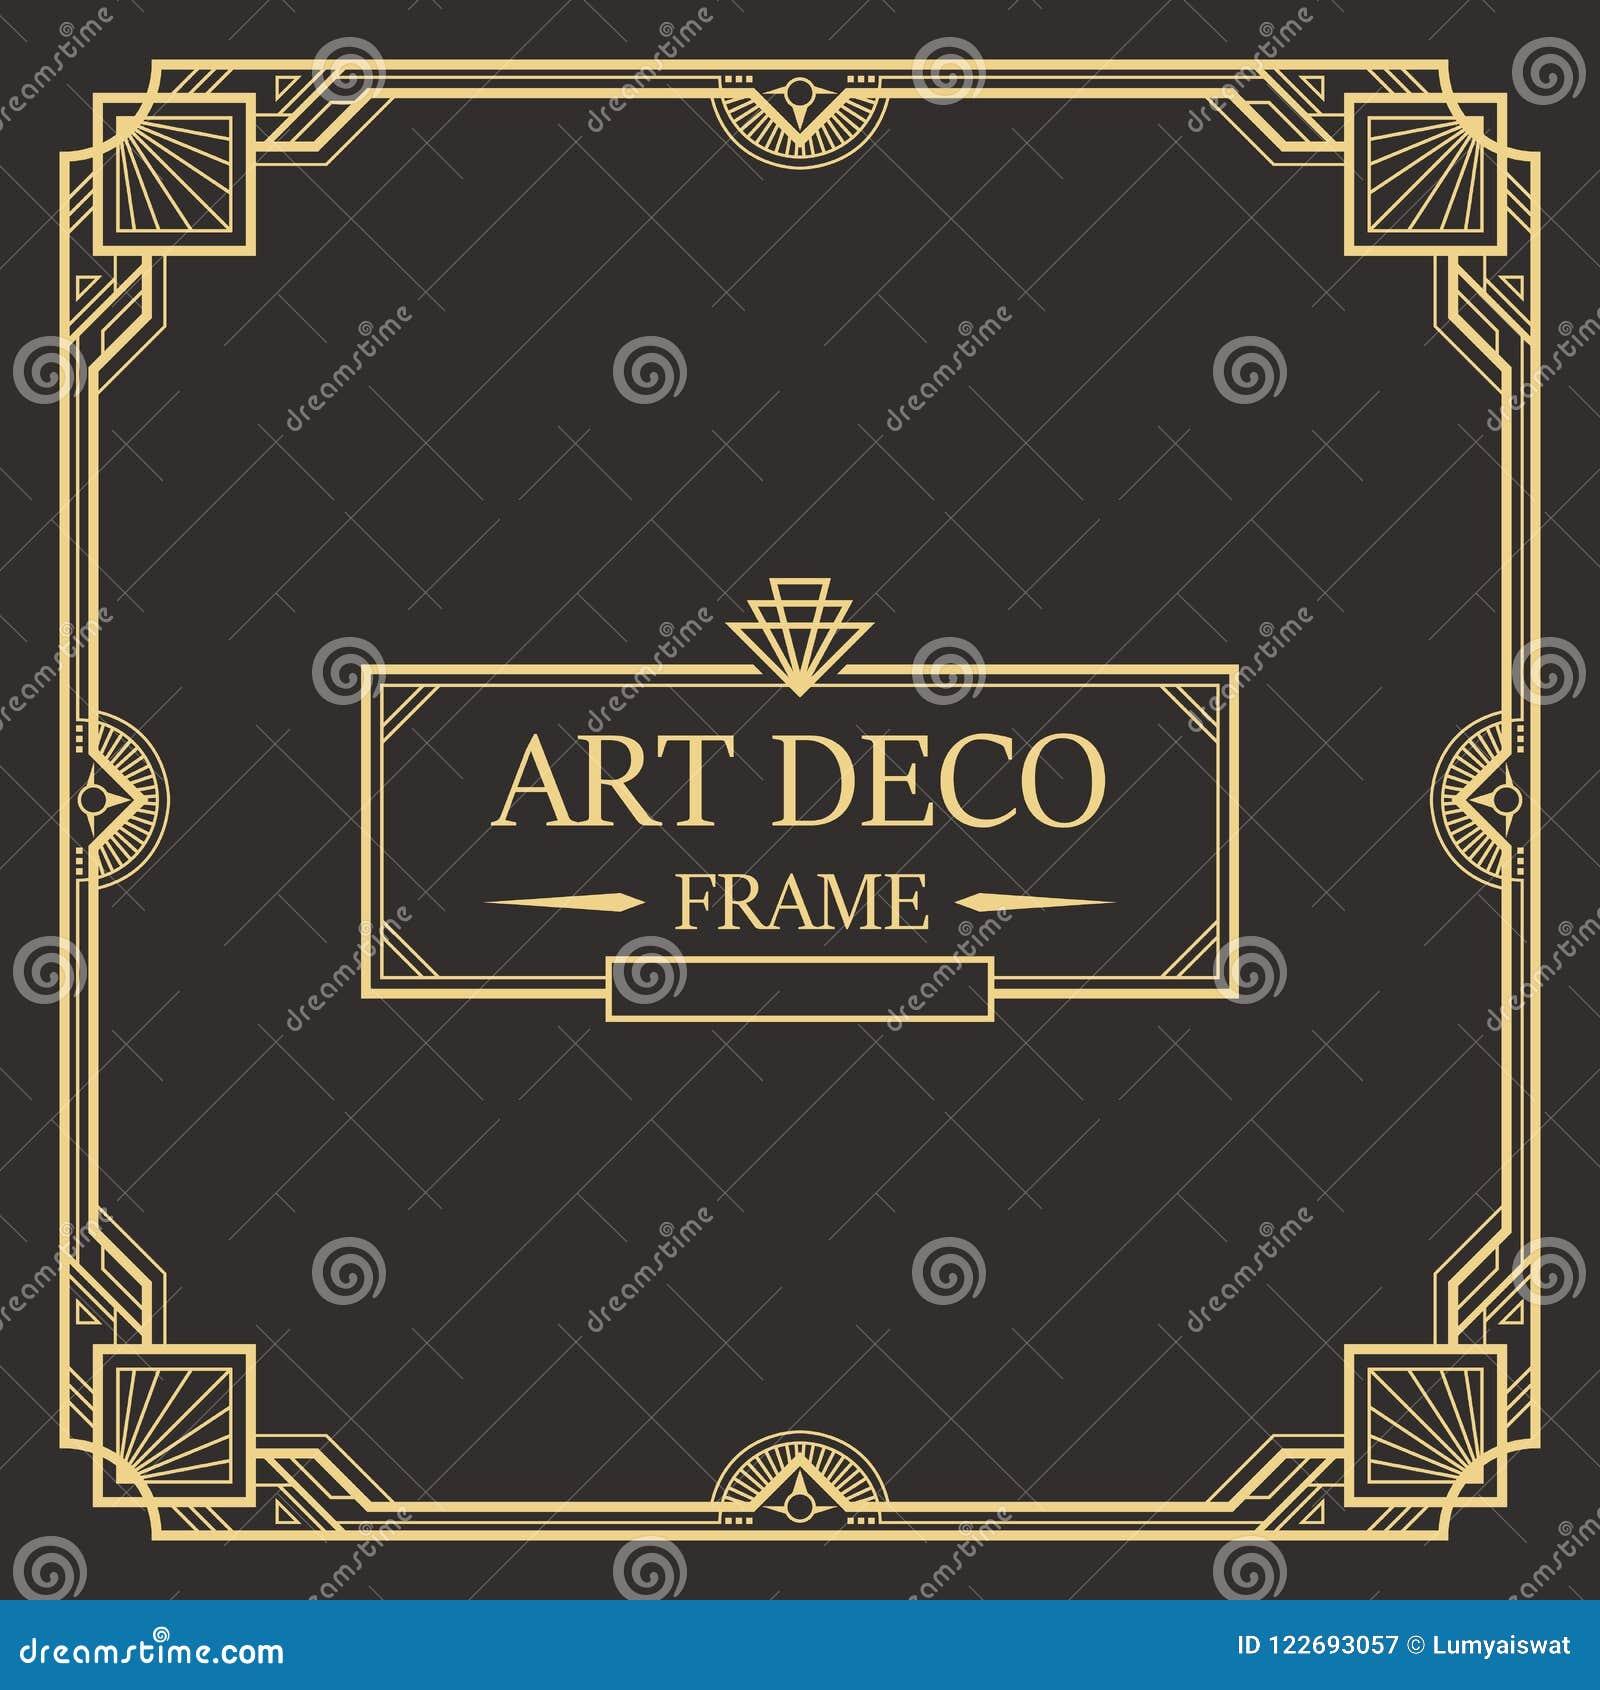 art deco border and frame template stock illustration illustration